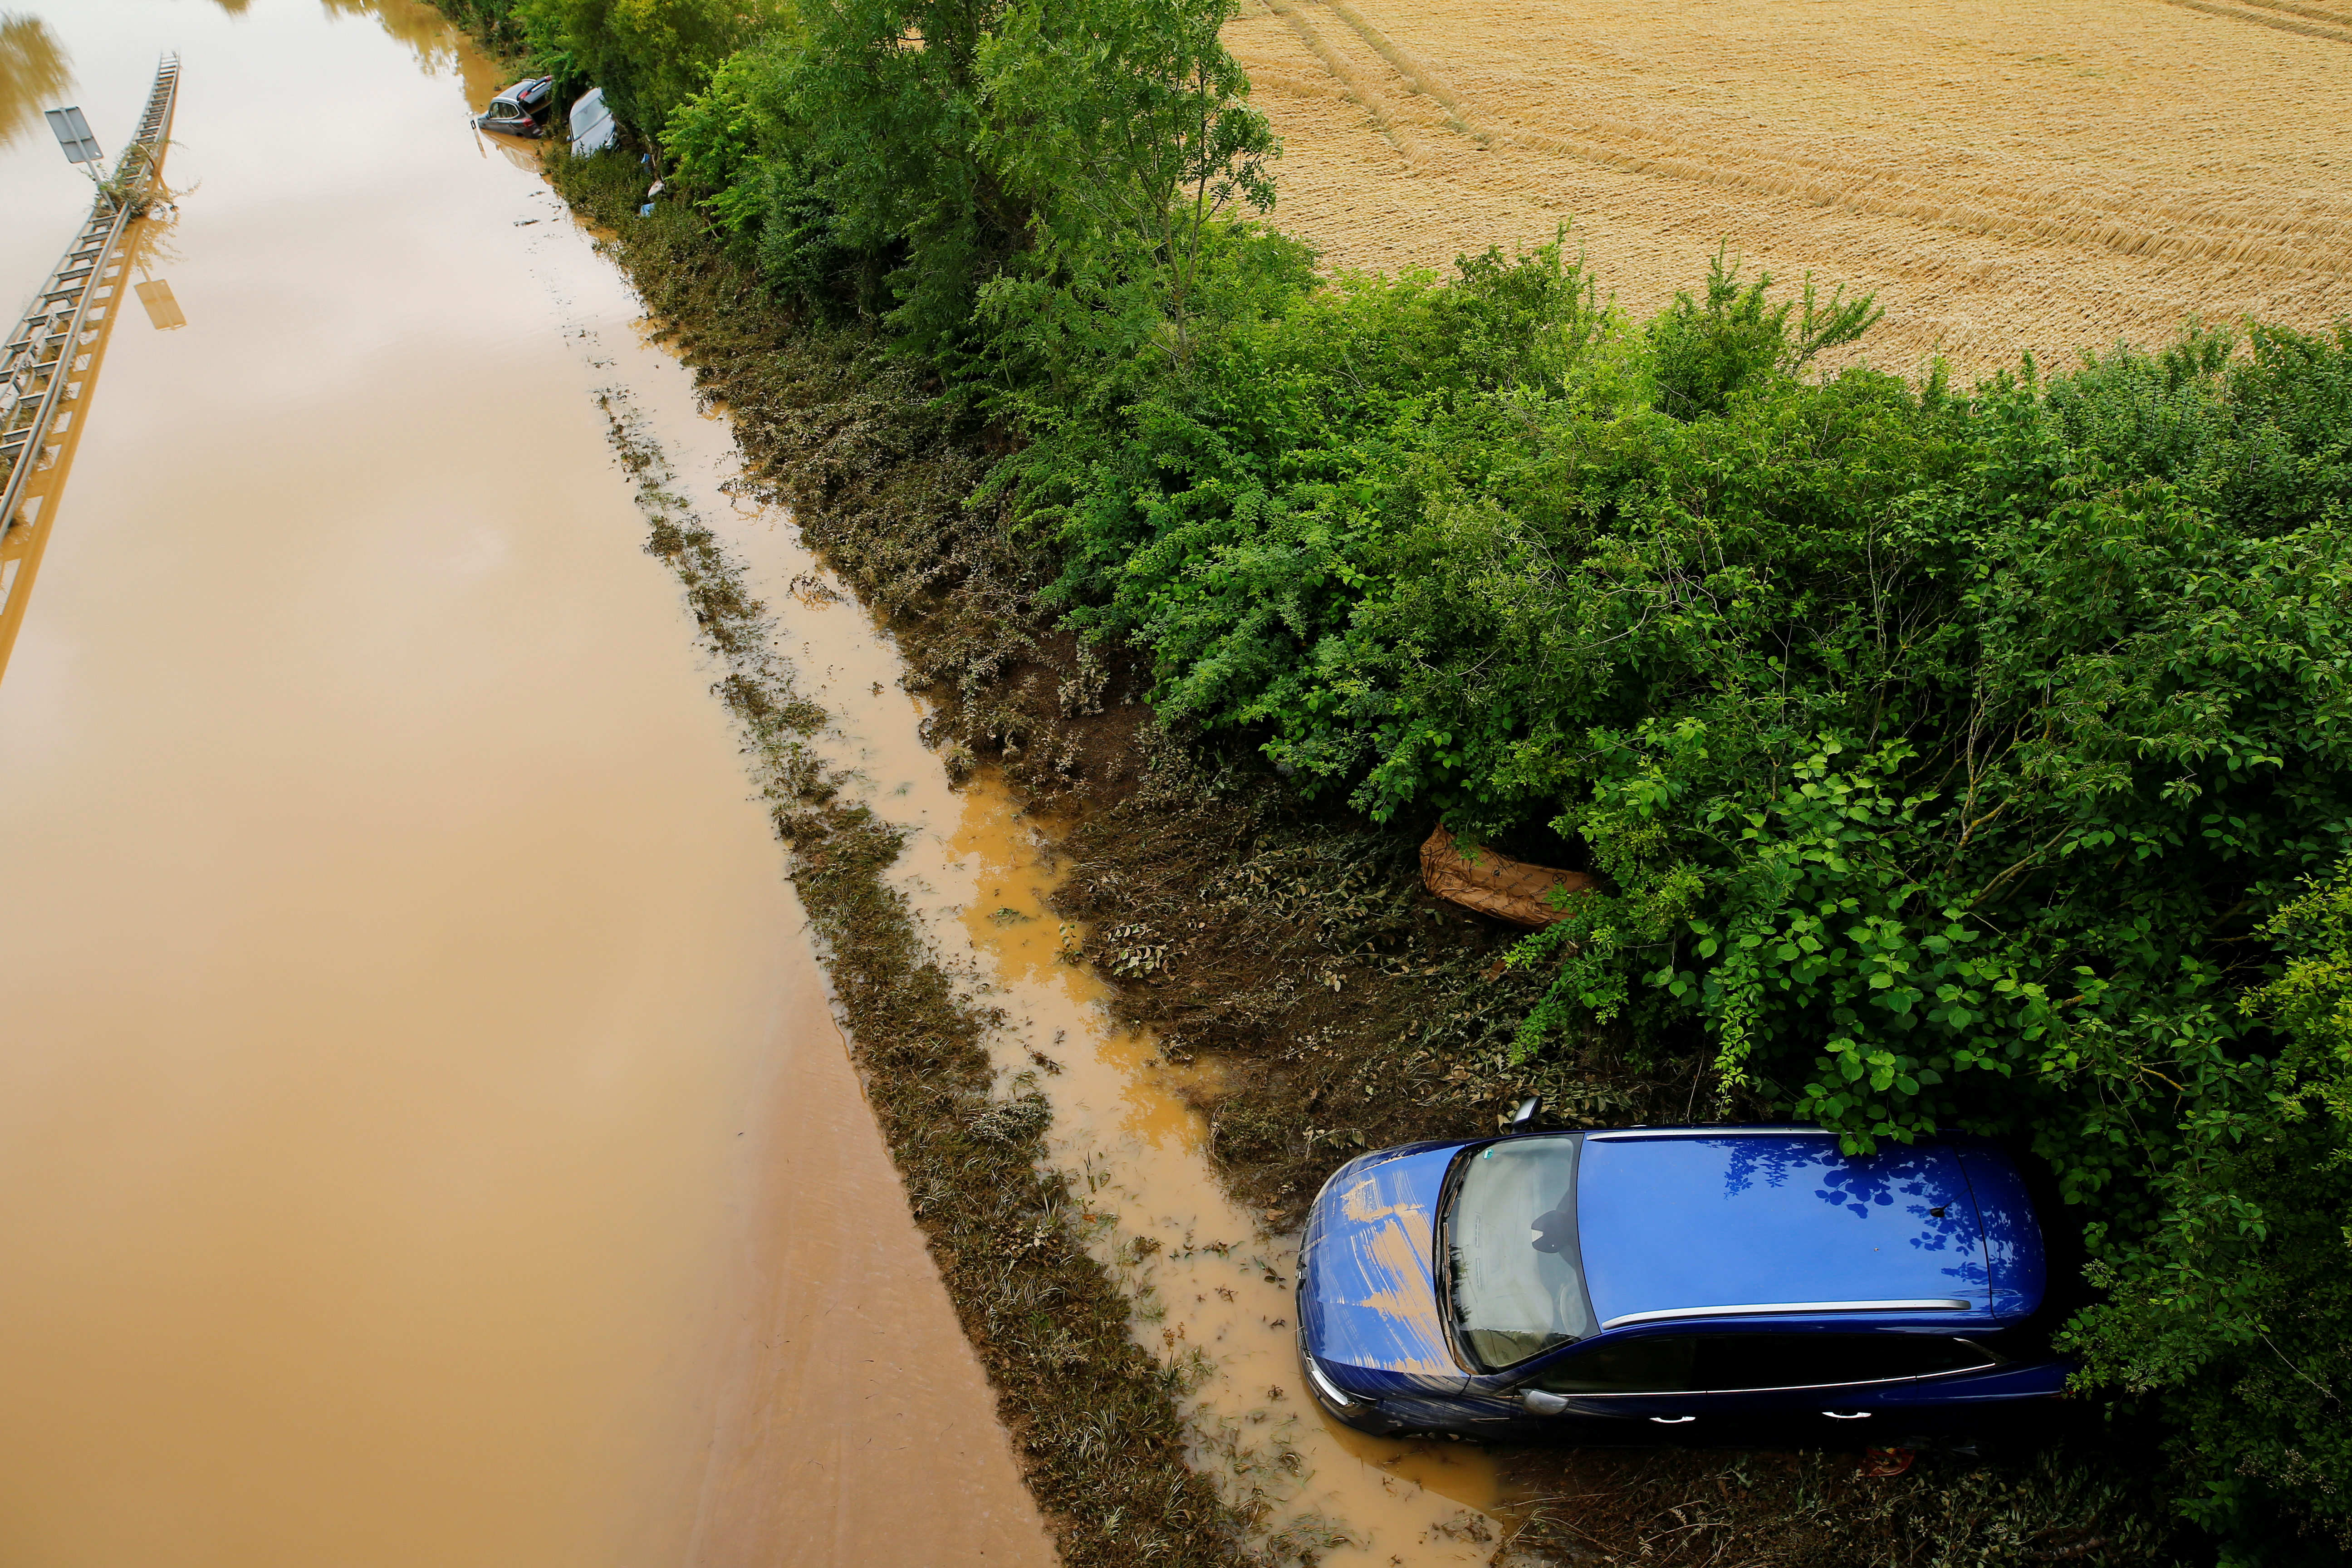 Damaged cars lie on a flooded street following heavy rainfalls in Erftstadt, Germany, July 16, 2021. REUTERS/Thilo Schmuelgen